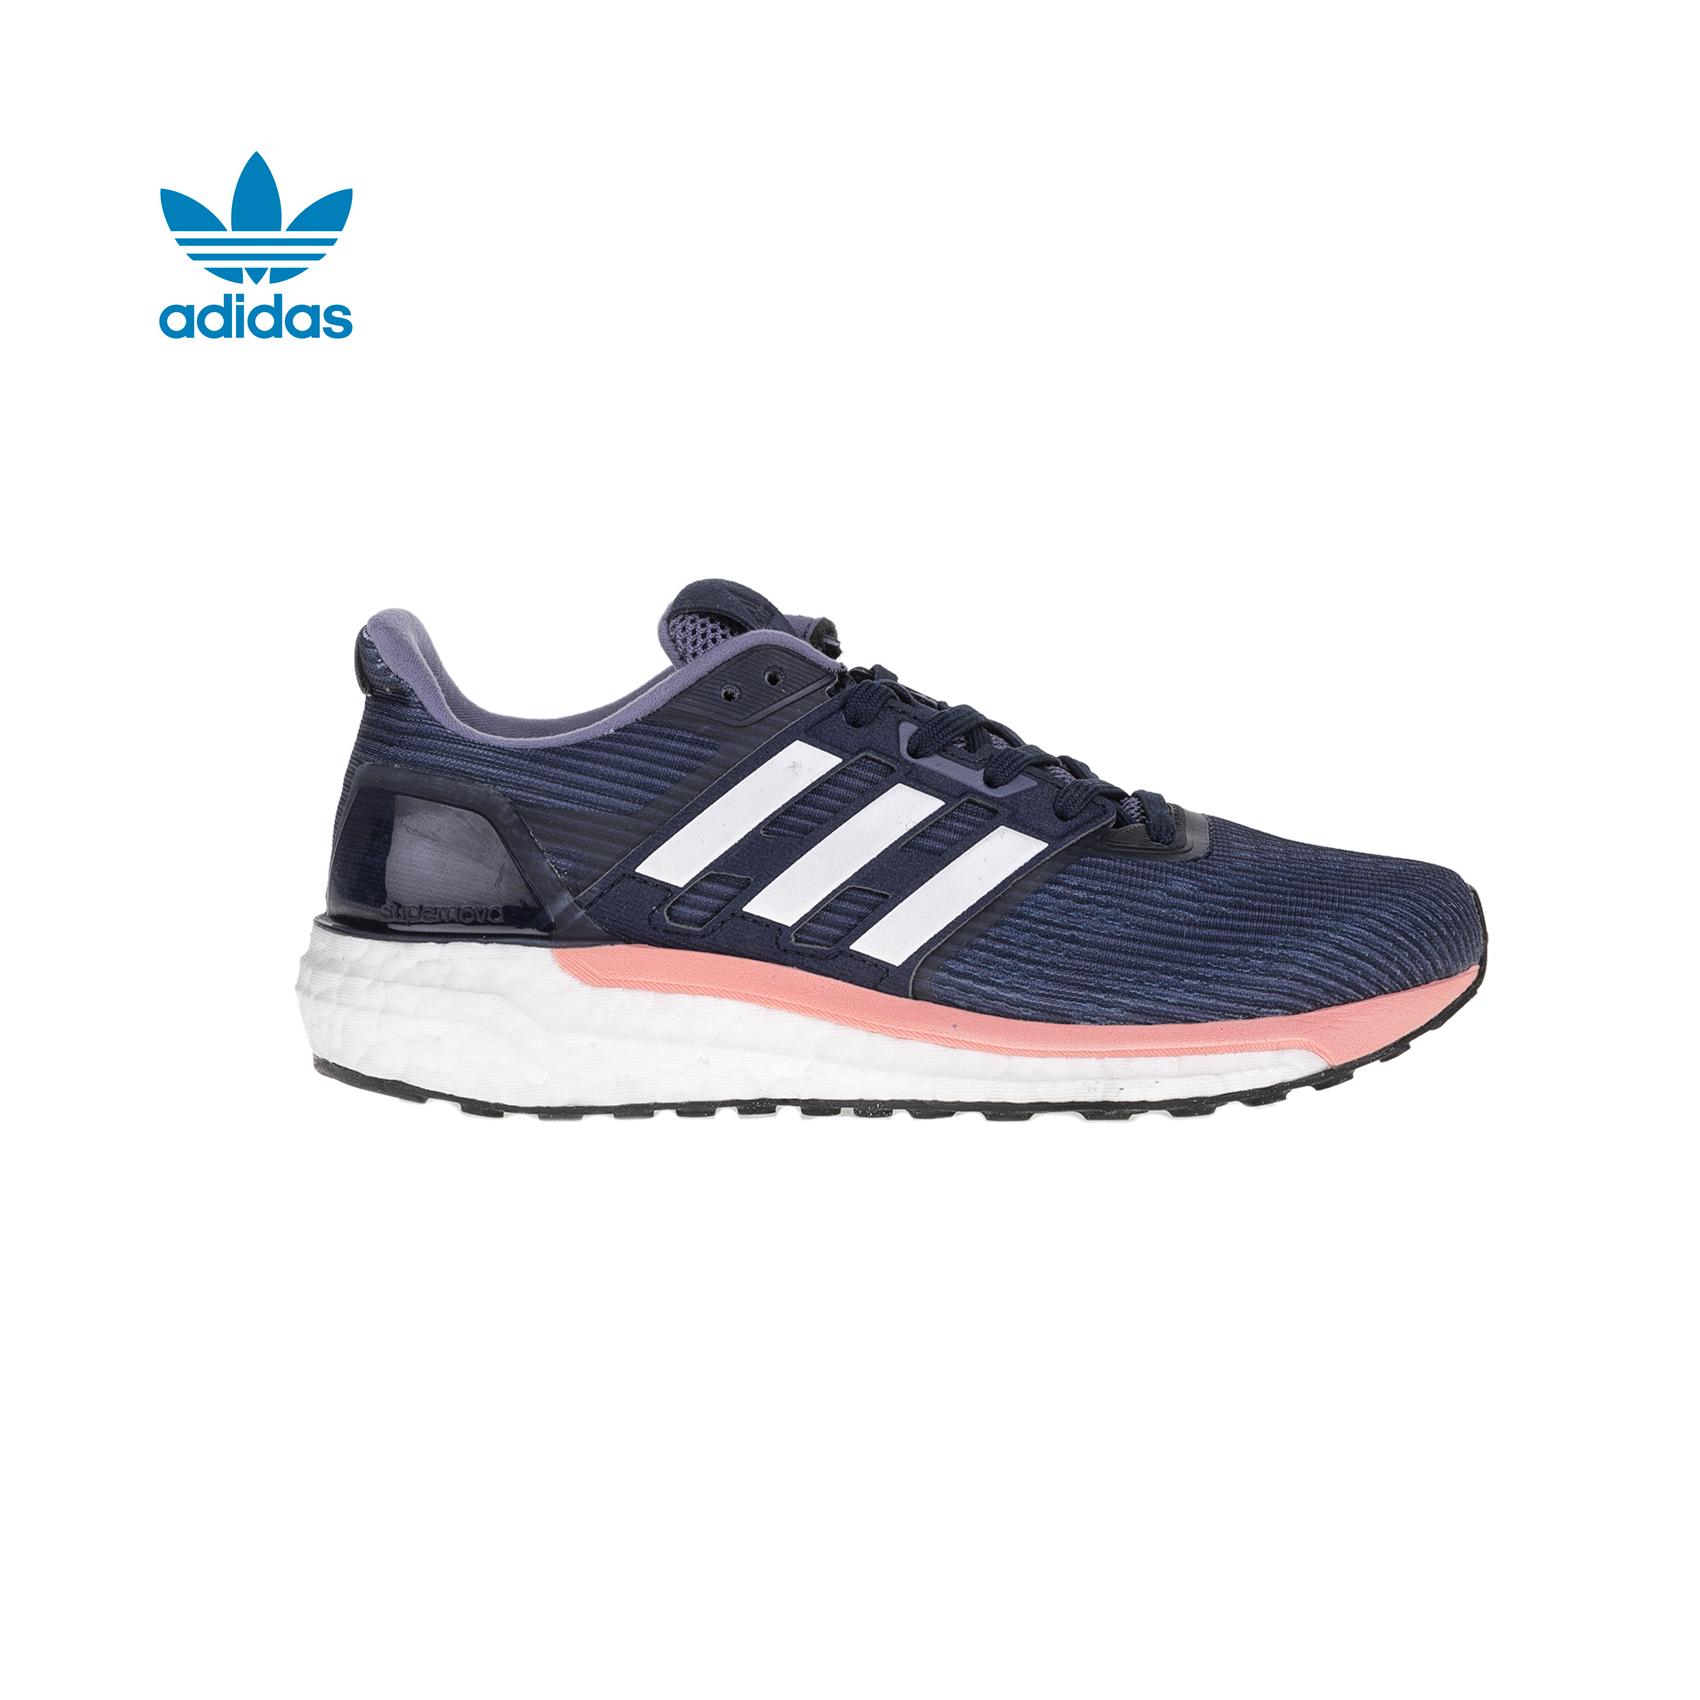 ADIDAS – Γυναικεία παπούτσια adidas supernova μπλε